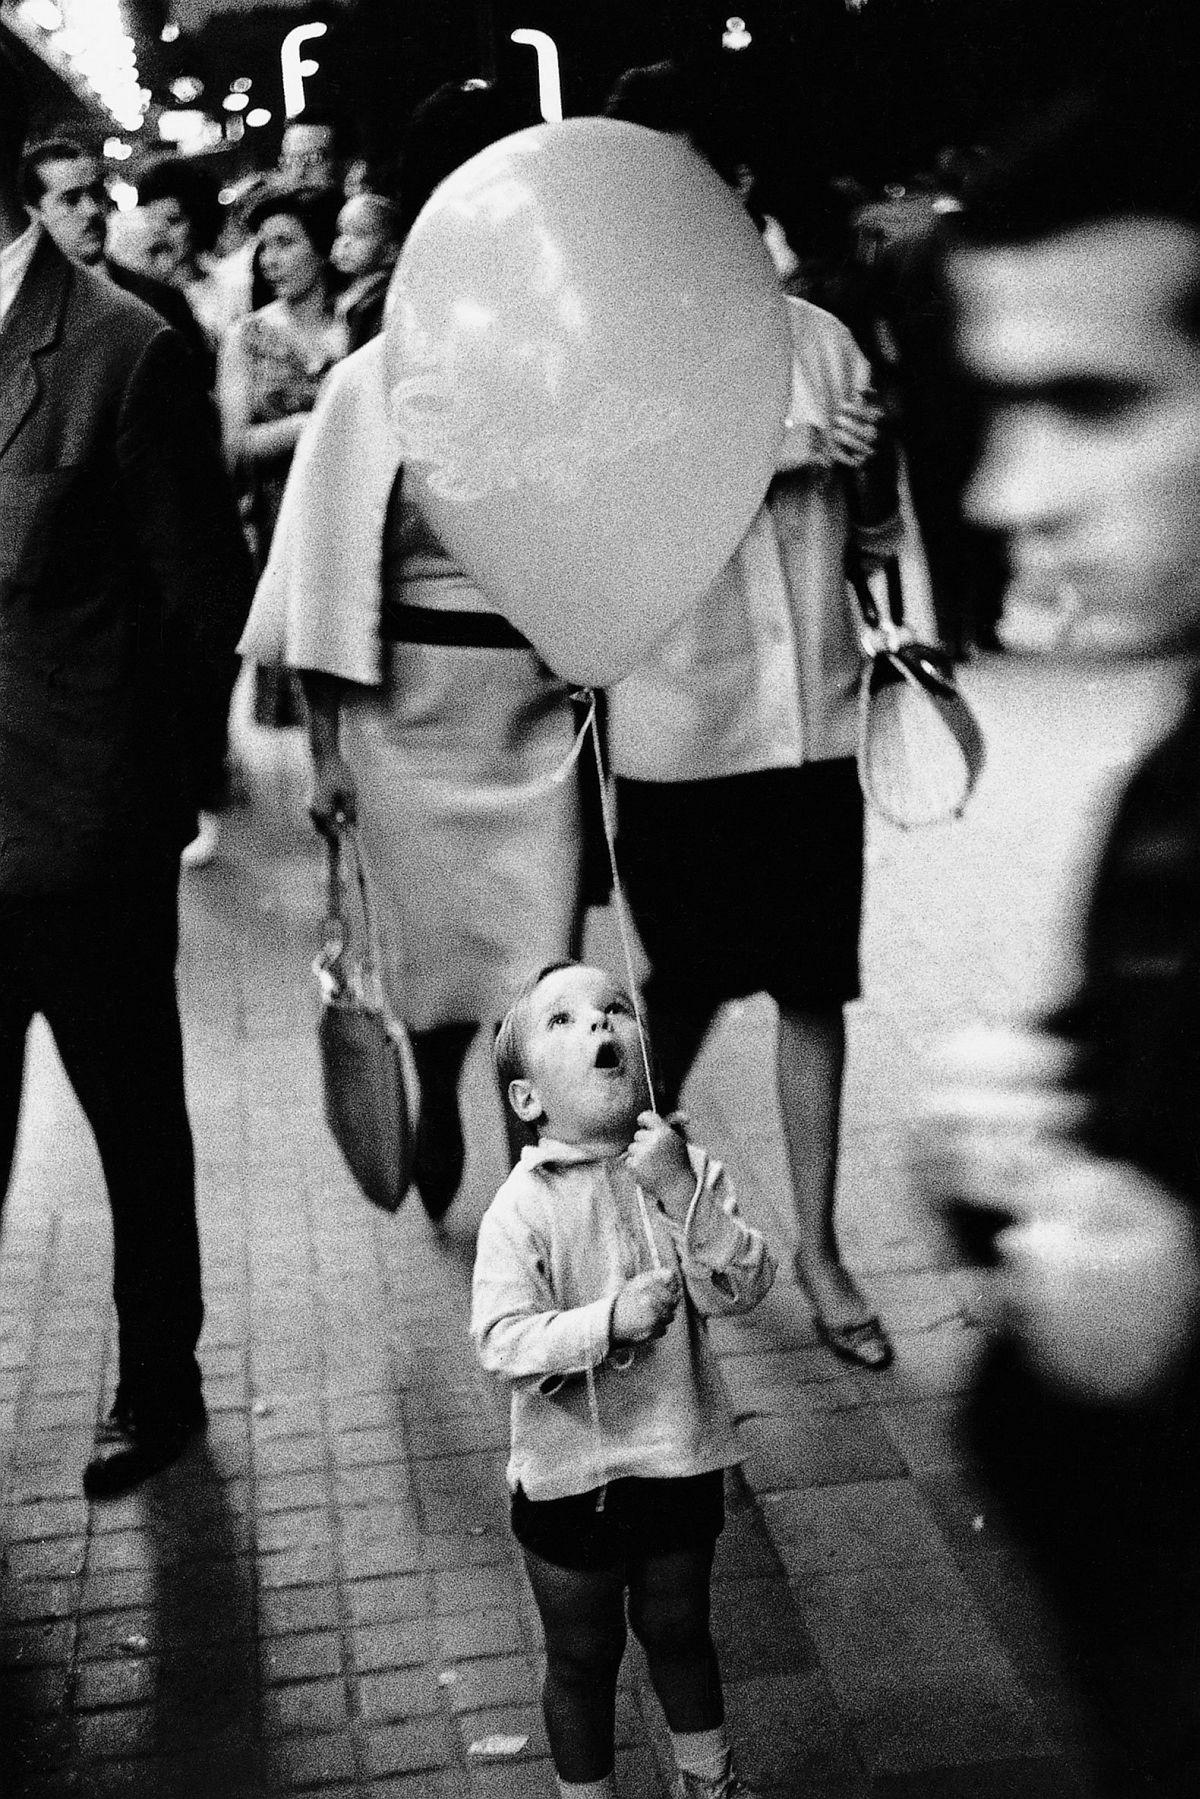 Calle Pelayo, 1962. By Xavier Miserachs. Photograph © Arena and Mar Miserachs, courtesy via La Fabrica